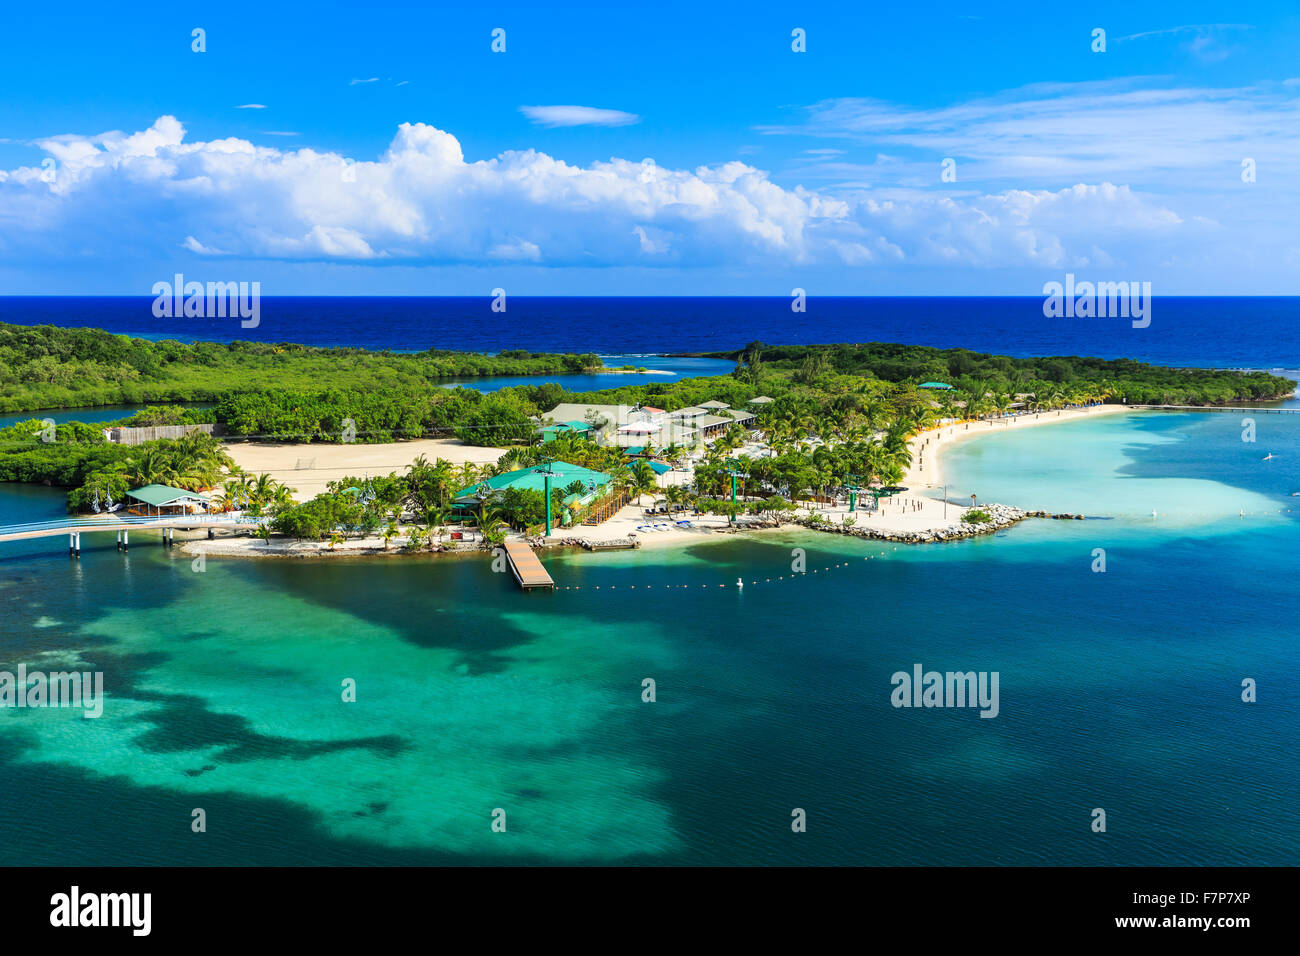 Roatan Island, Honduras. Panoramic view of the island. - Stock Image